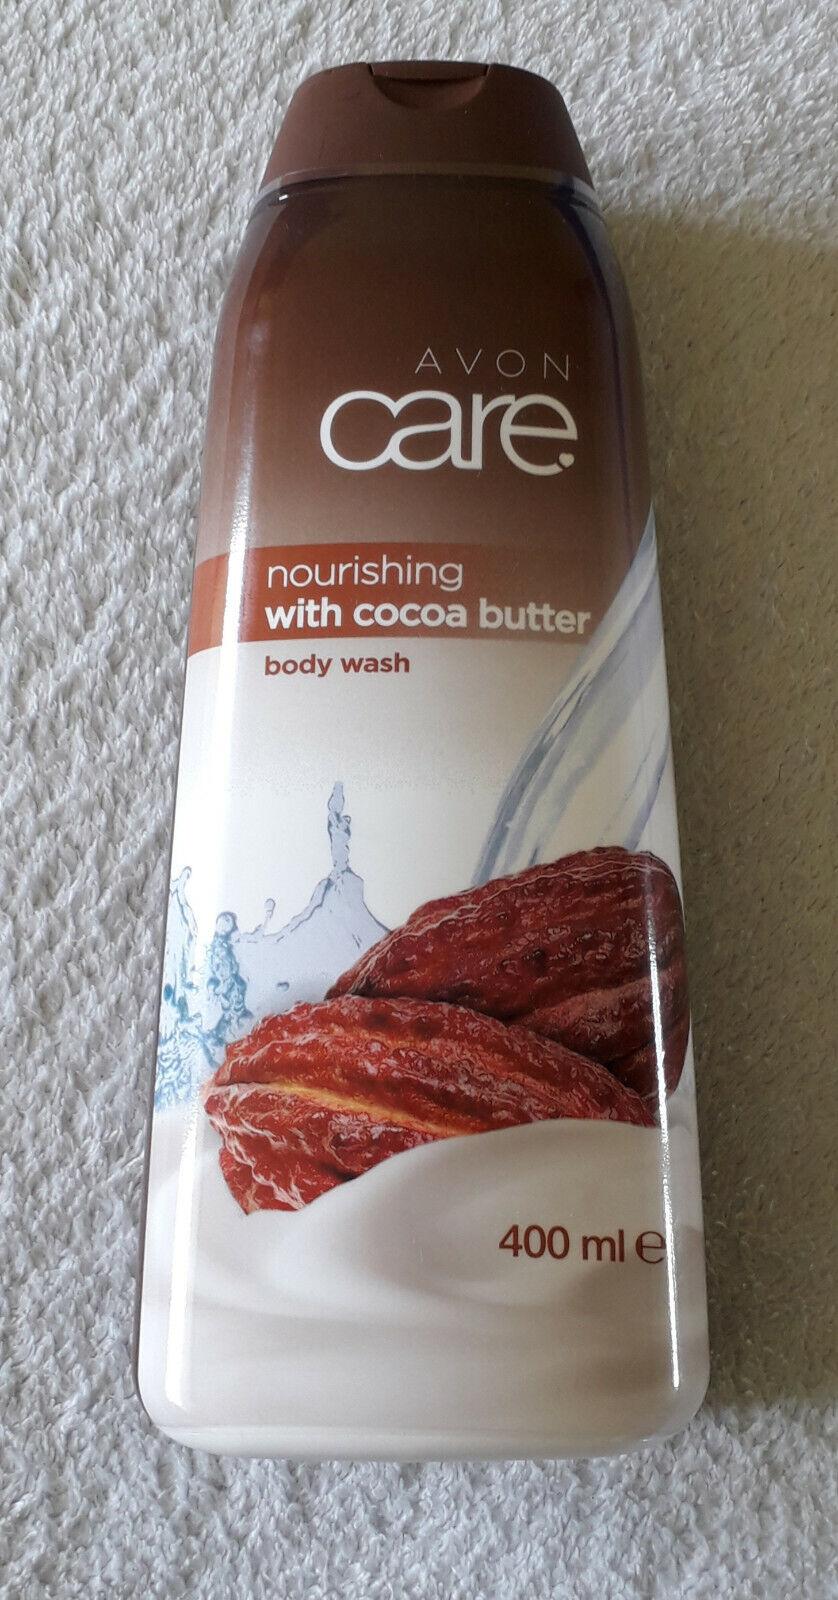 Avon- Care Nourishing Duschgel mit Kakaobutter und Vitamin E, 400 ml, Neu🦜